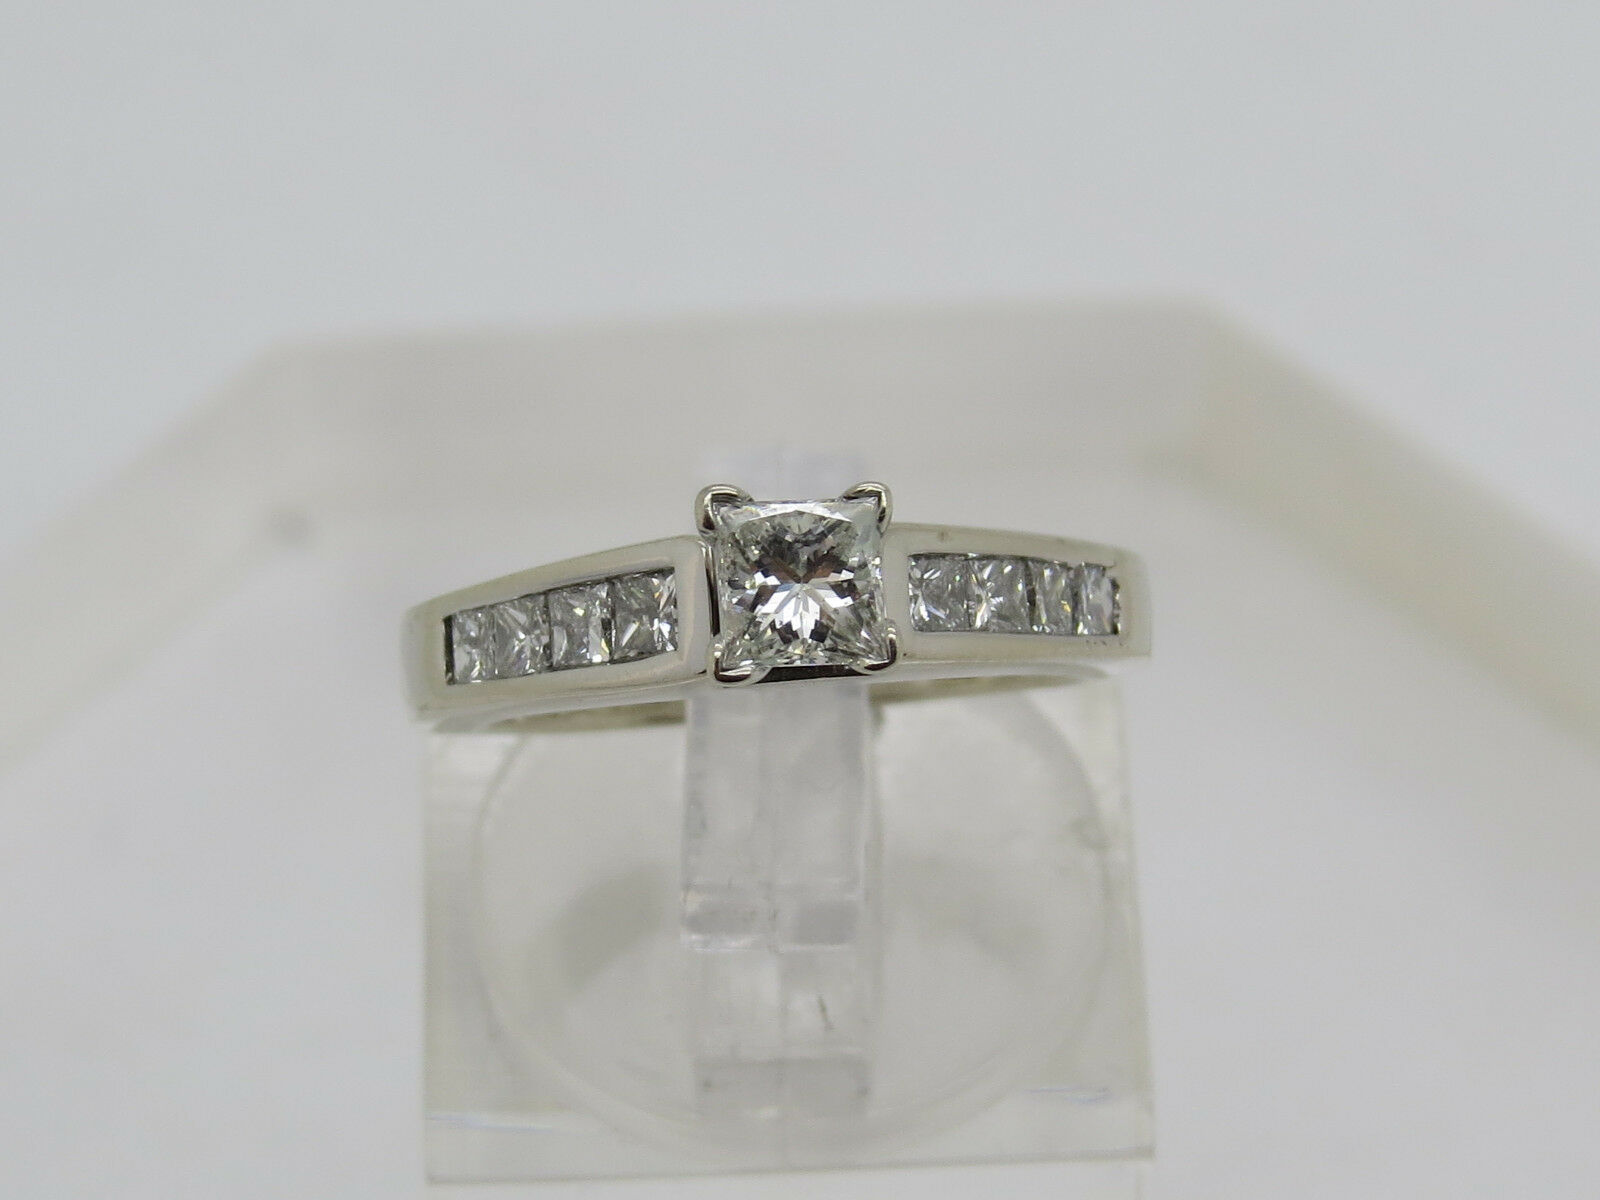 Solid 14k White gold Princess Cut .94 CTW Diamond Solitaire Accent Ring Sz 4.75